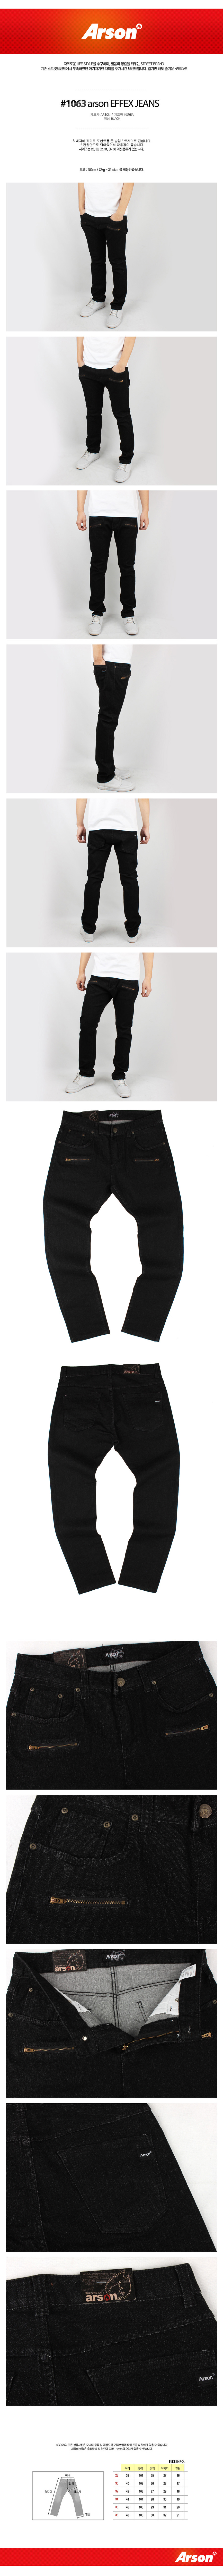 [ ARSON ] [纵火]真正的纵火案 1063 EFFEX 牛仔裤(黑色)男牛仔裤牛仔裤牛仔裤的纵火案